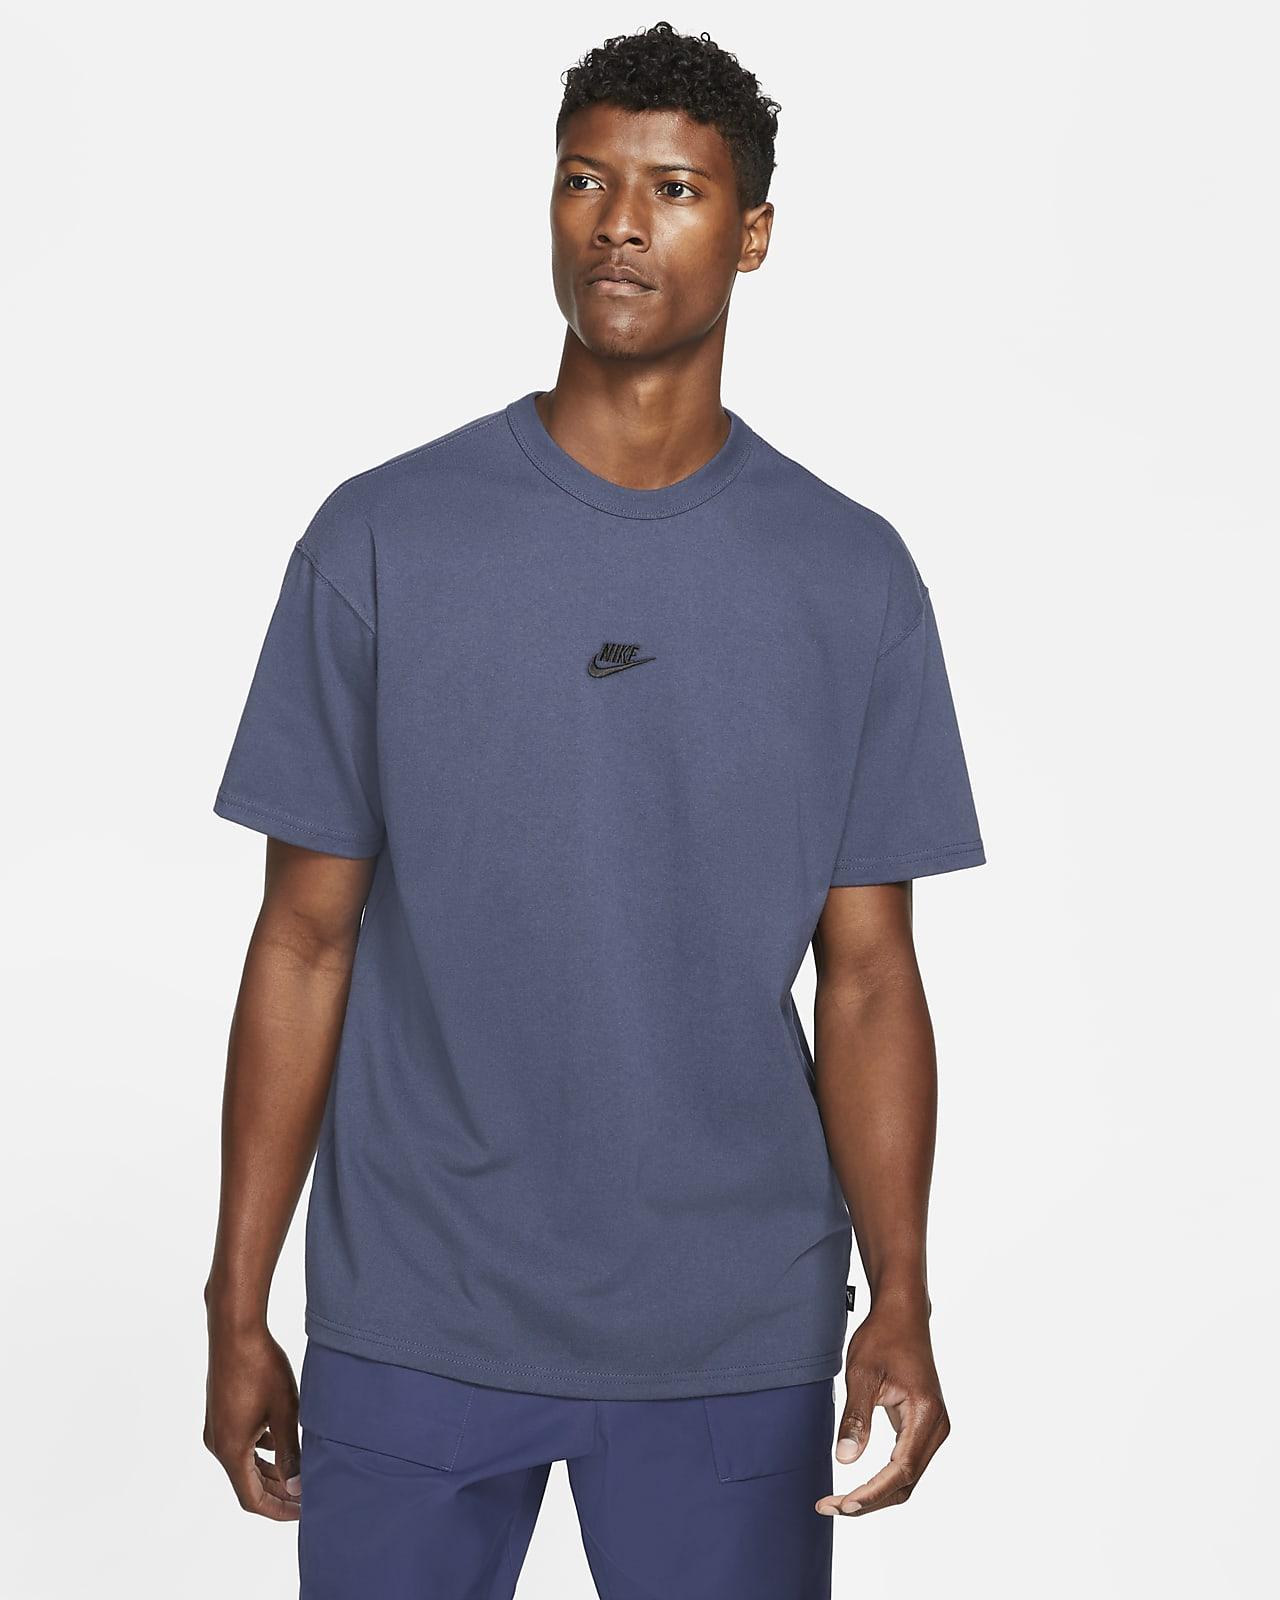 T-shirt Nike Sportswear Premium Essential för män